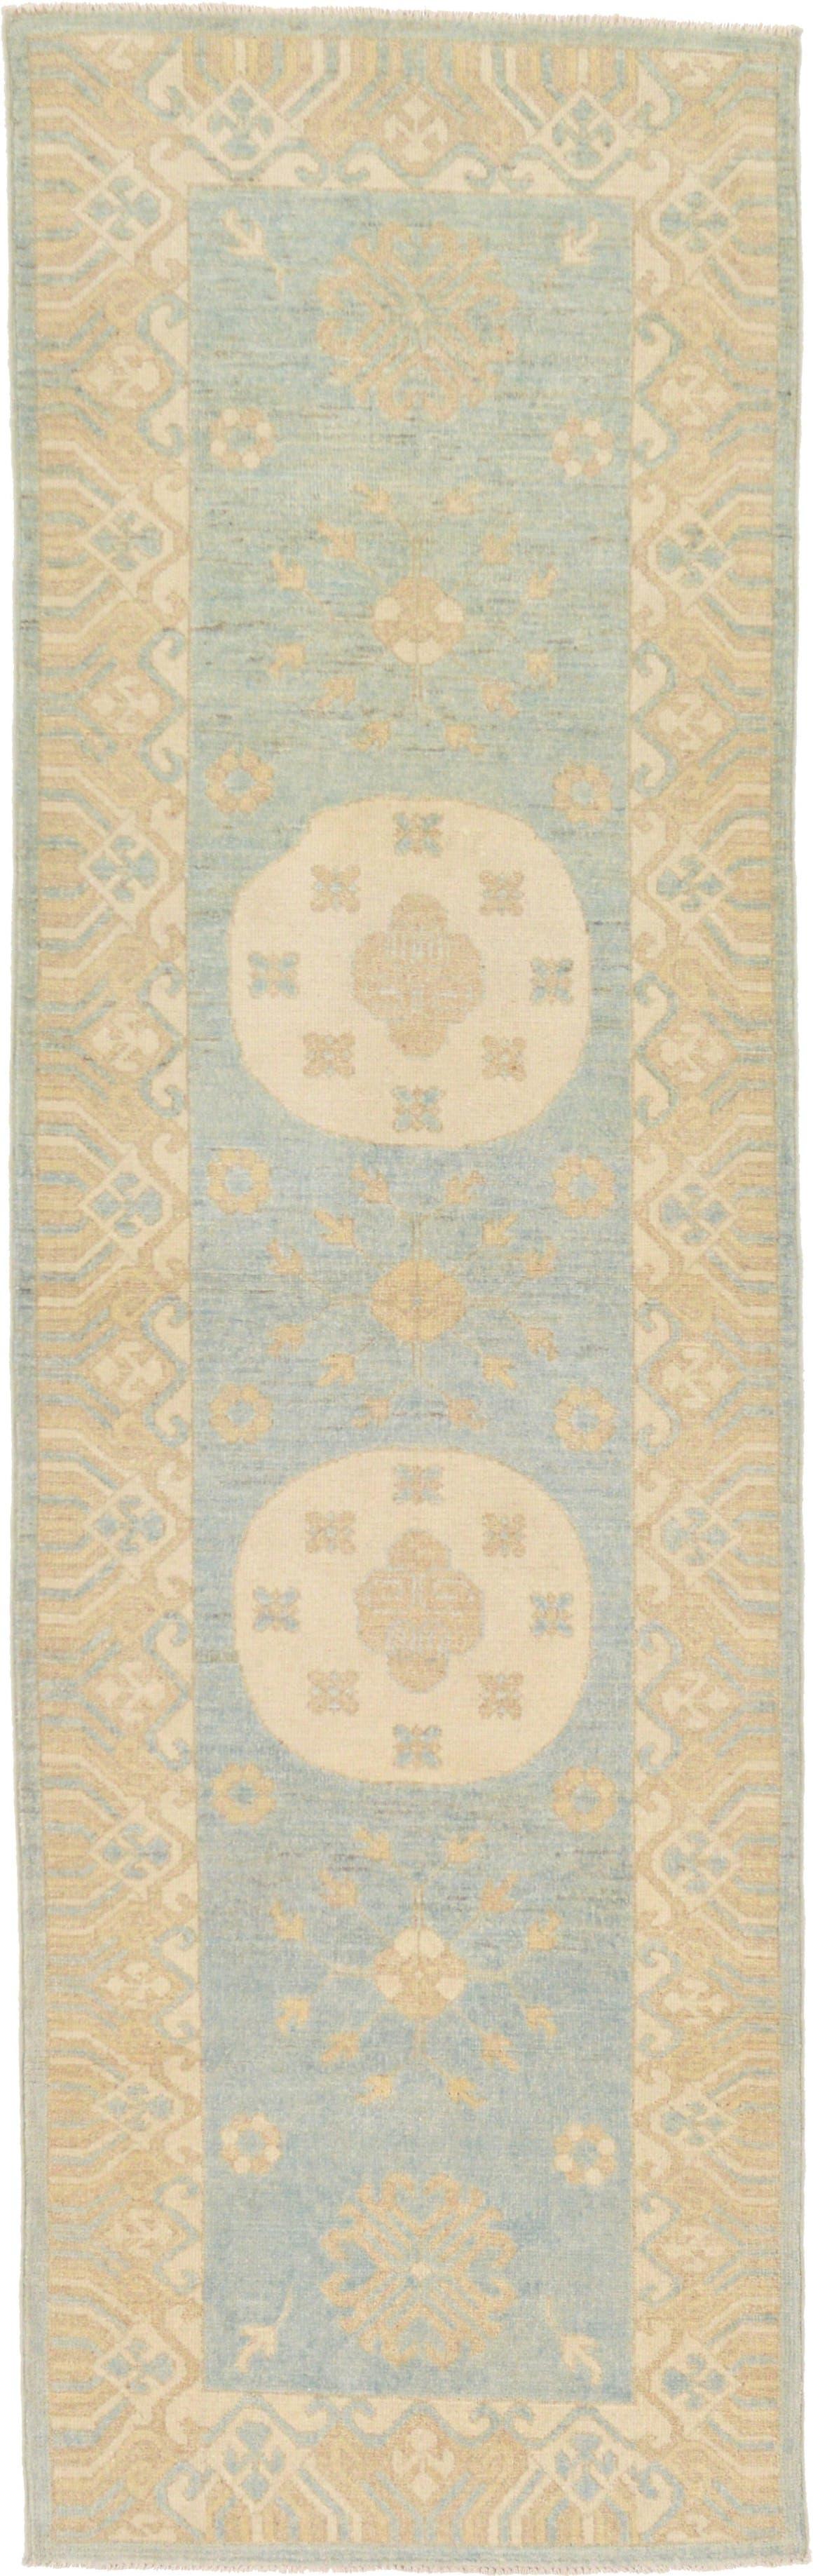 3' x 9' 8 Khotan Ziegler Oriental Runner Rug main image